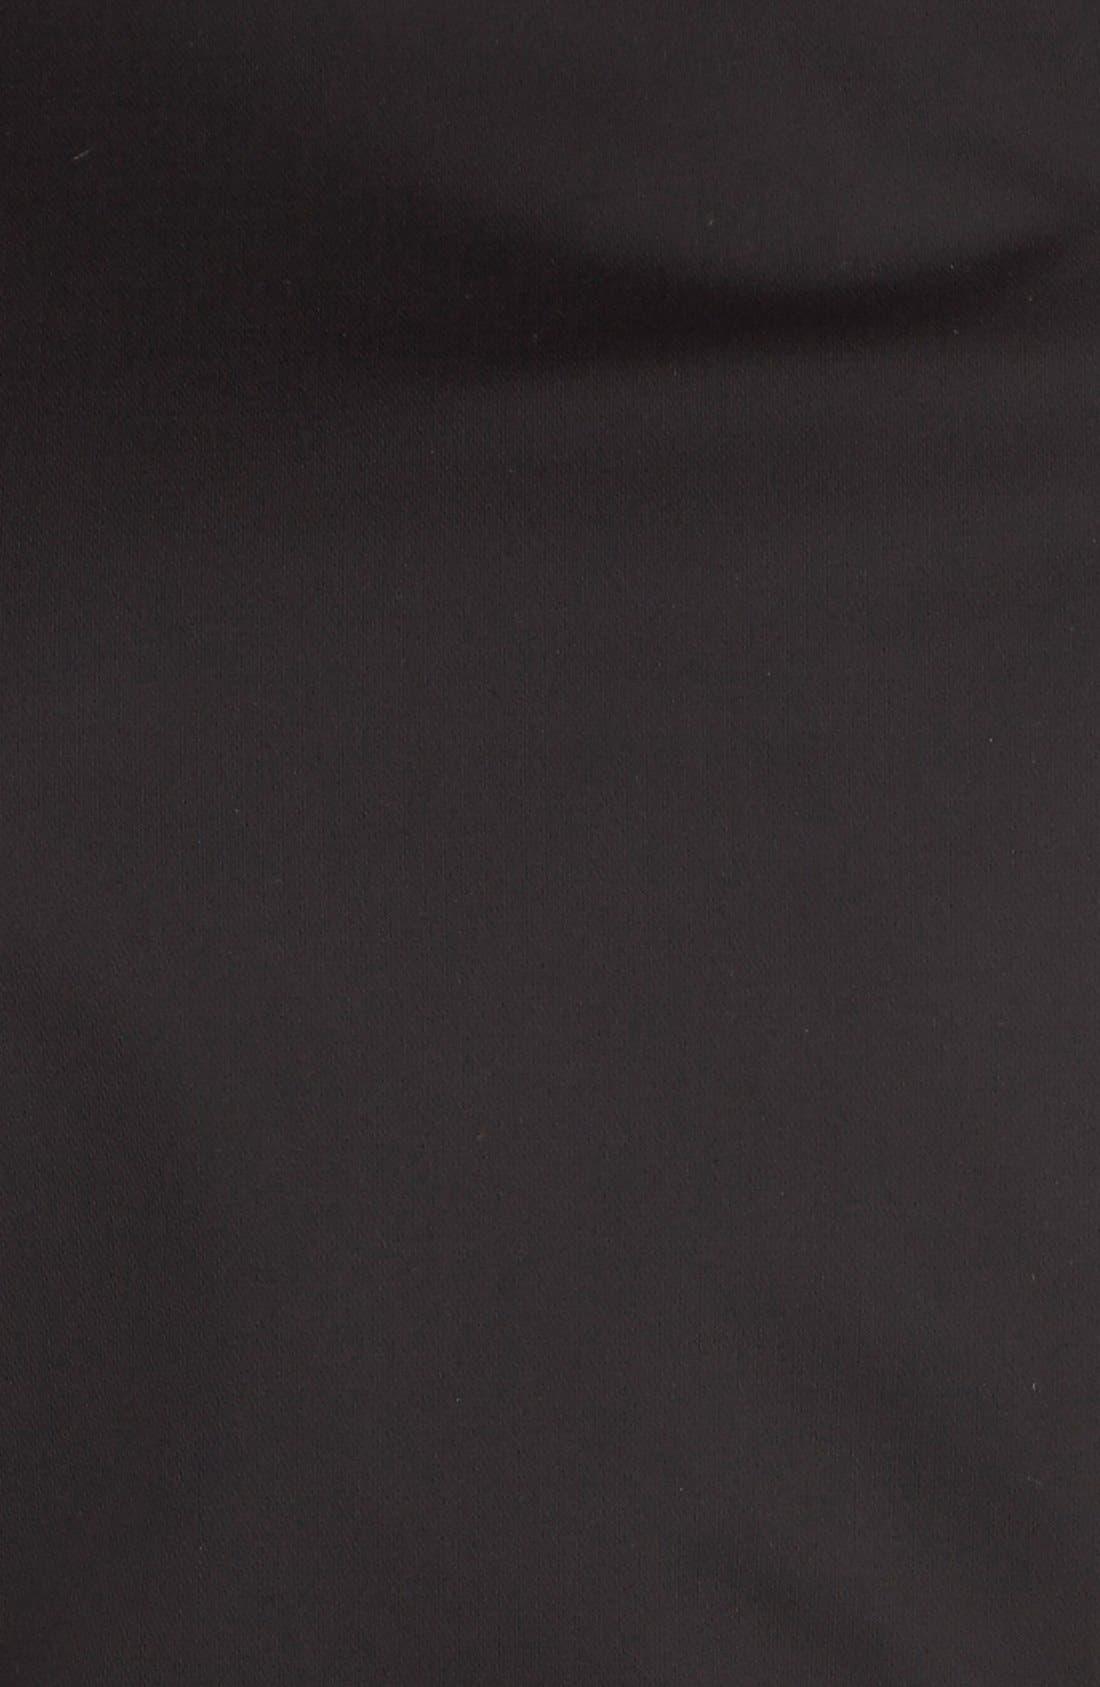 Short Zip Trench Coat,                             Alternate thumbnail 4, color,                             001